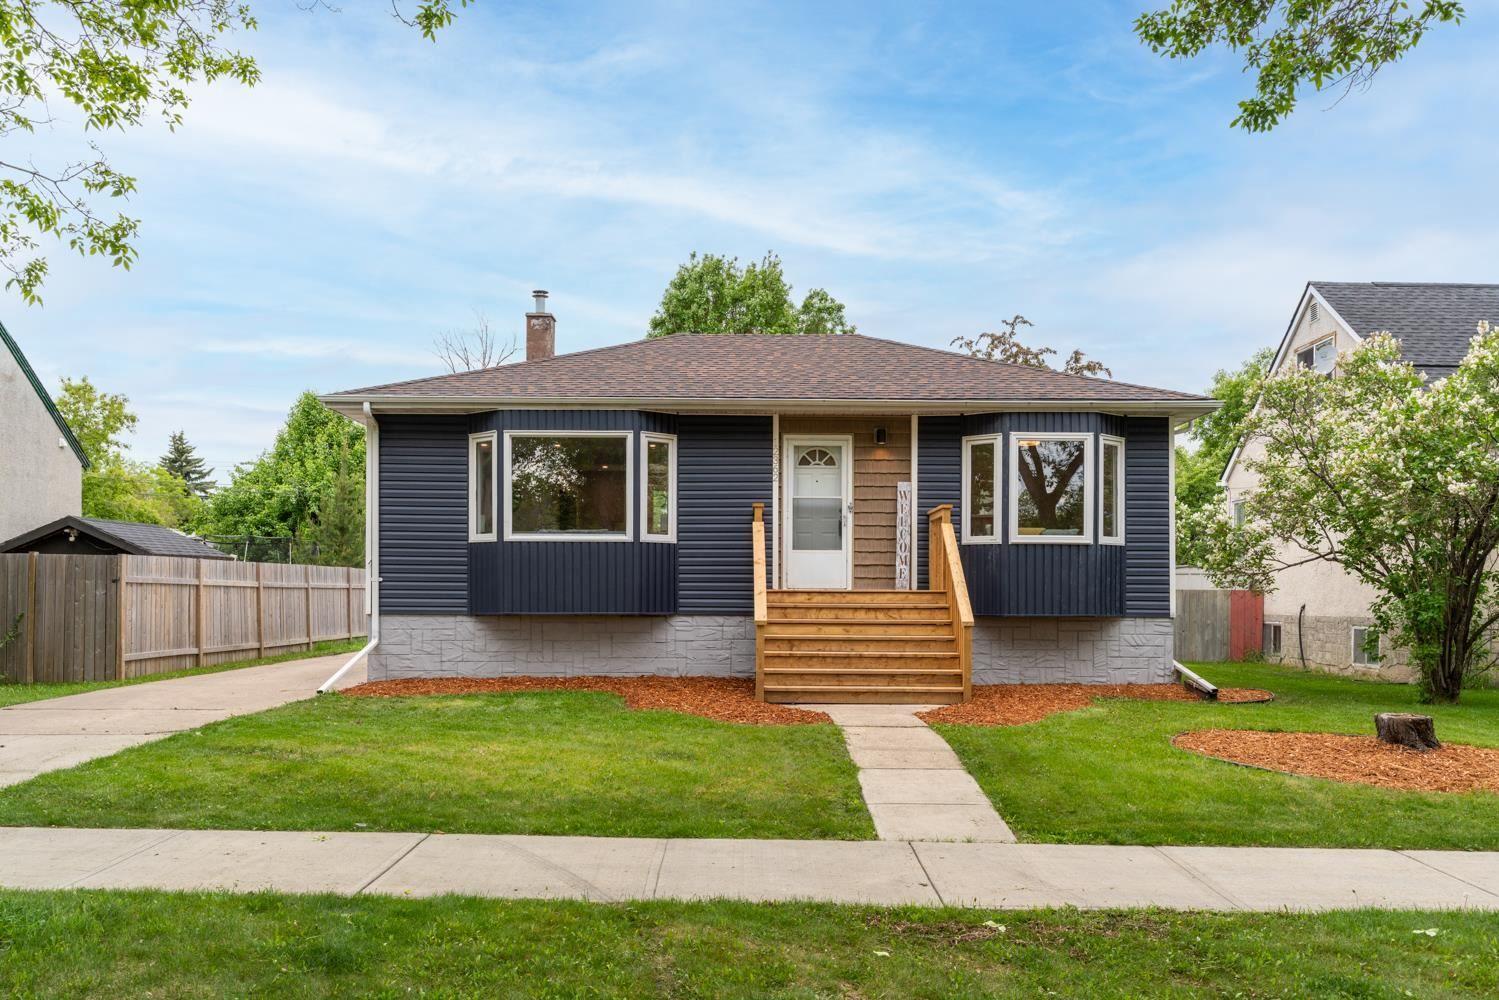 Main Photo: 12362 131 Street in Edmonton: Zone 04 House for sale : MLS®# E4248961